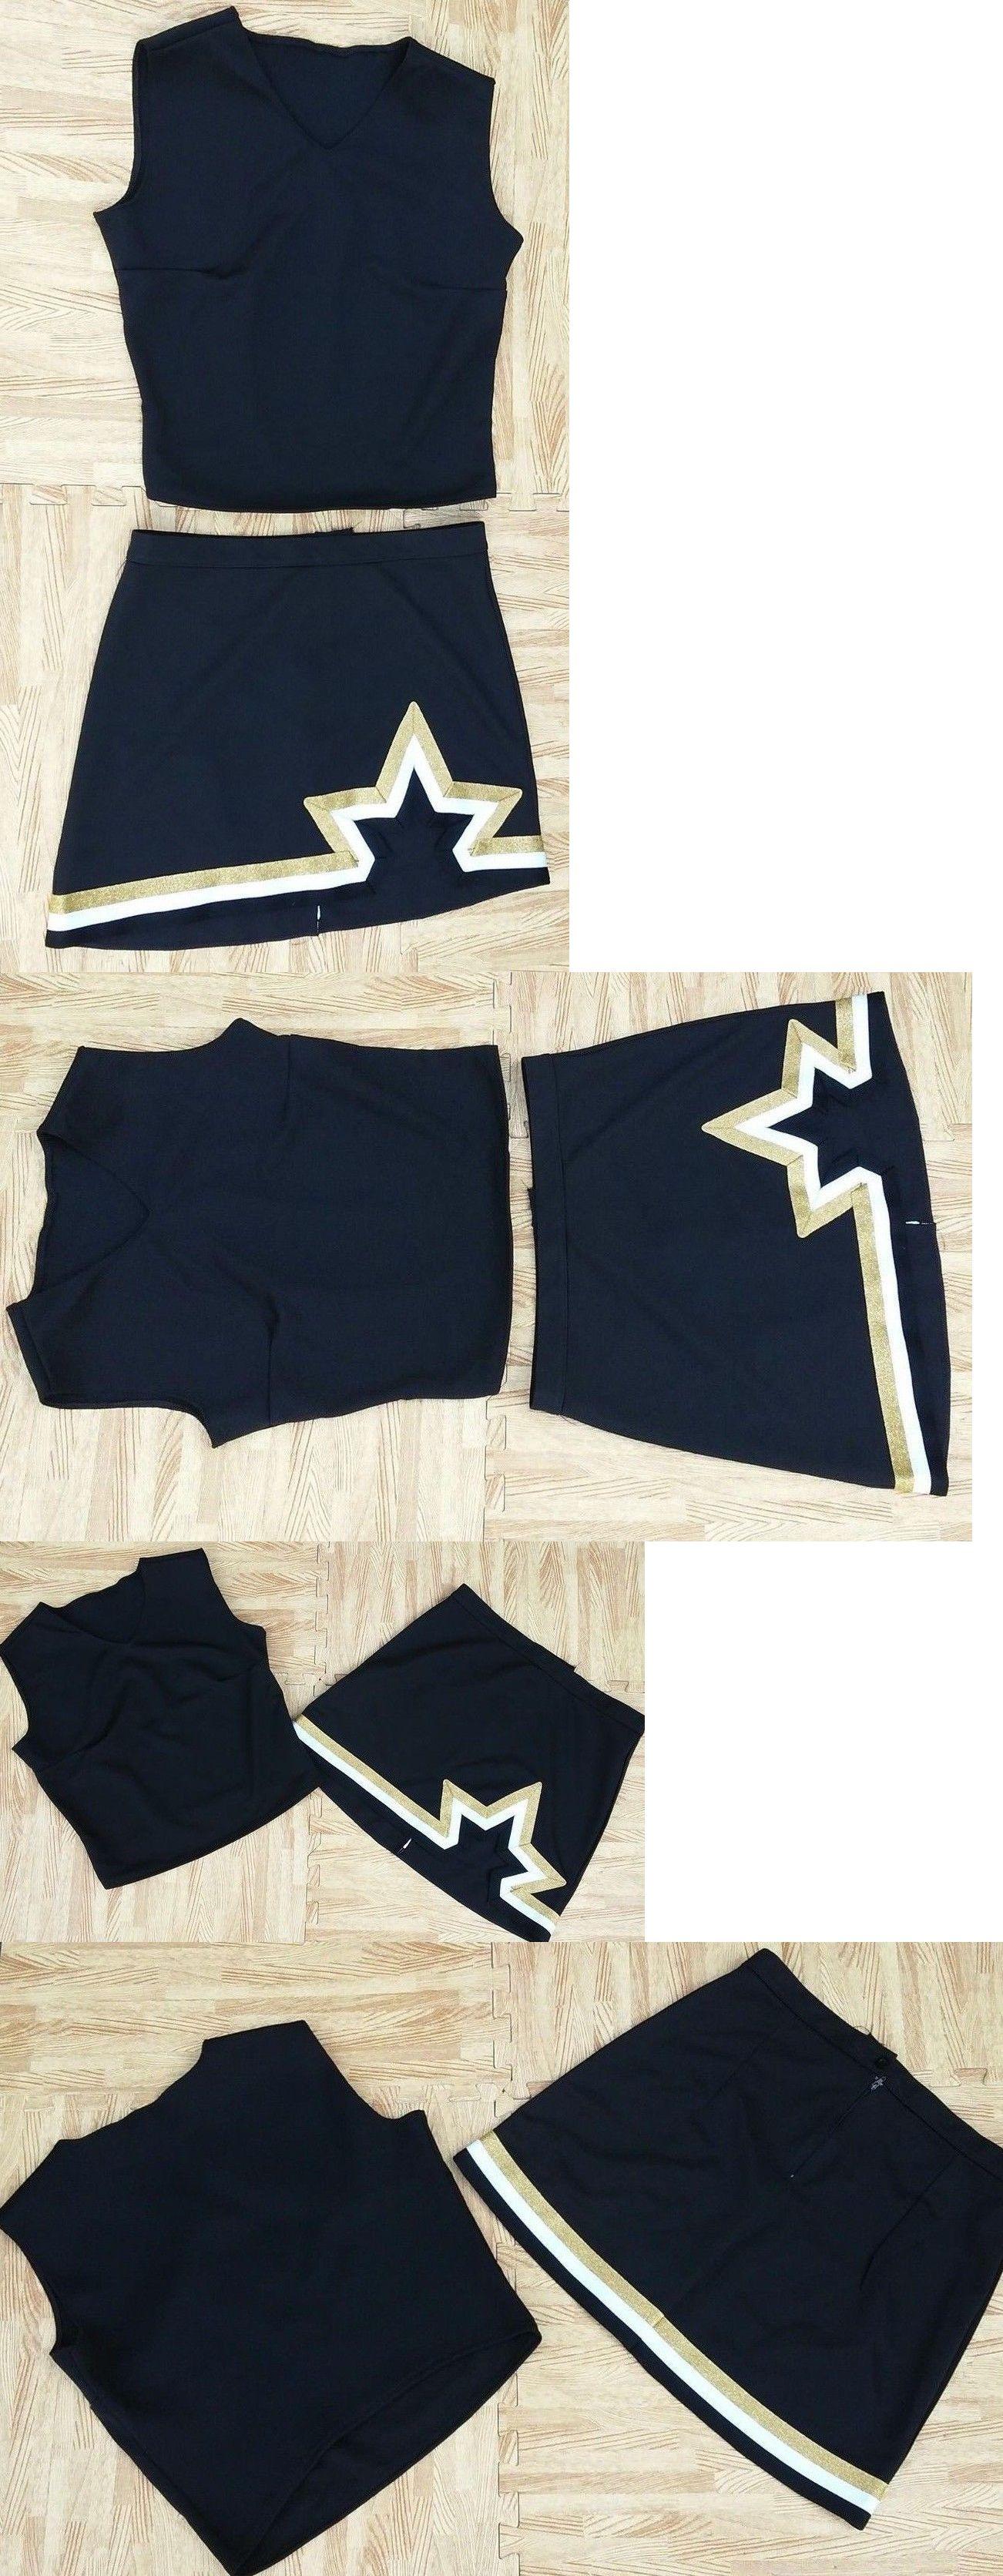 c0af02fdcec Cheerleading 66832  Adult L Real Black Gold Cheerleader Uniform Top Skirt  38-40 30-31 Saints New -  BUY IT NOW ONLY   30.99 on  eBay  cheerleading   adult .